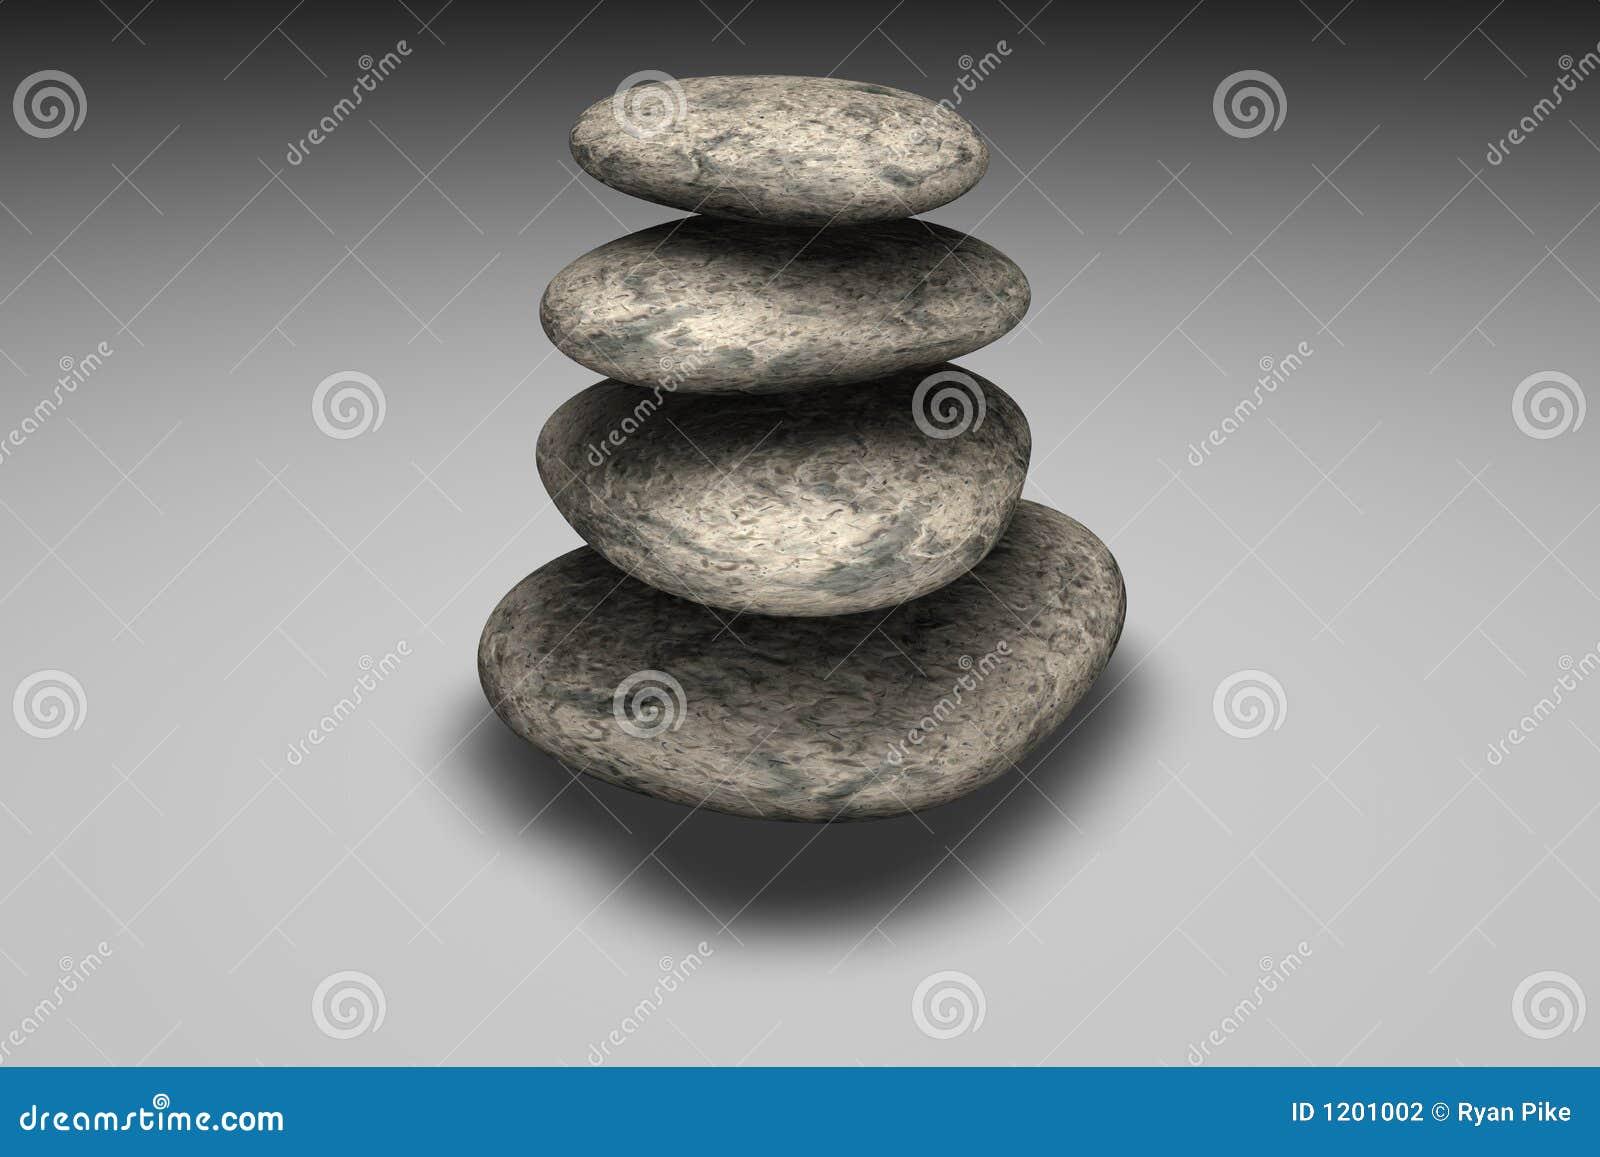 Balancing of rocks